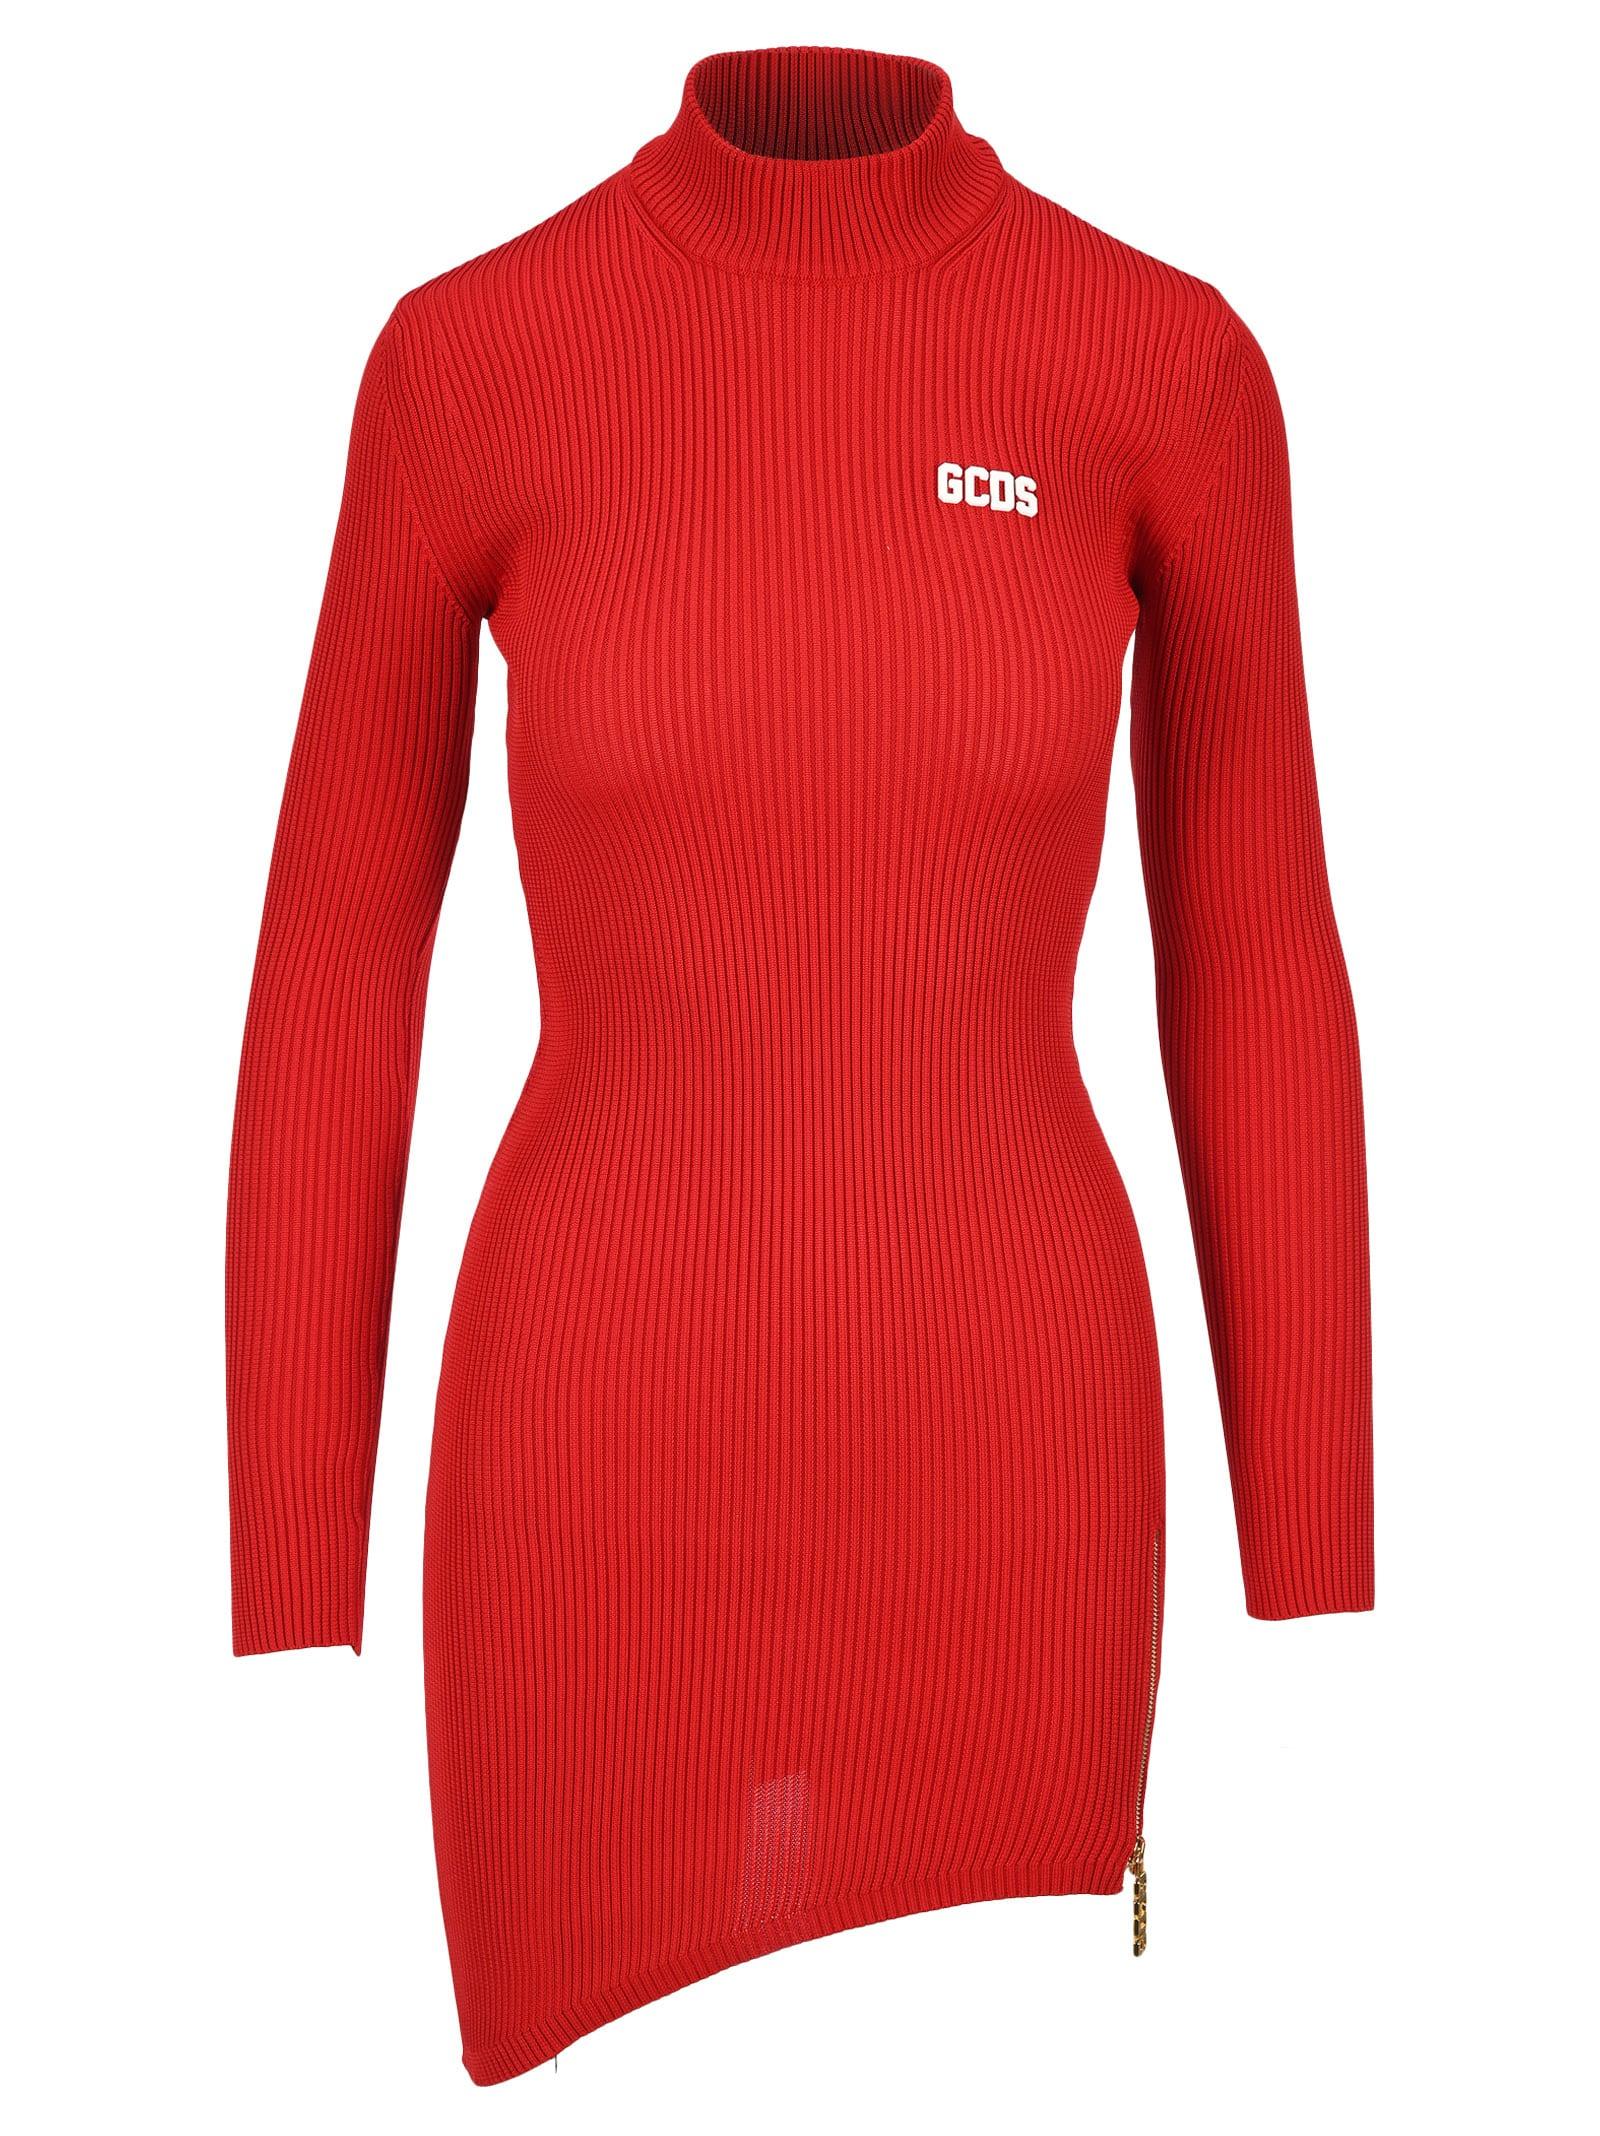 Gcds Ribbed Mini Dress